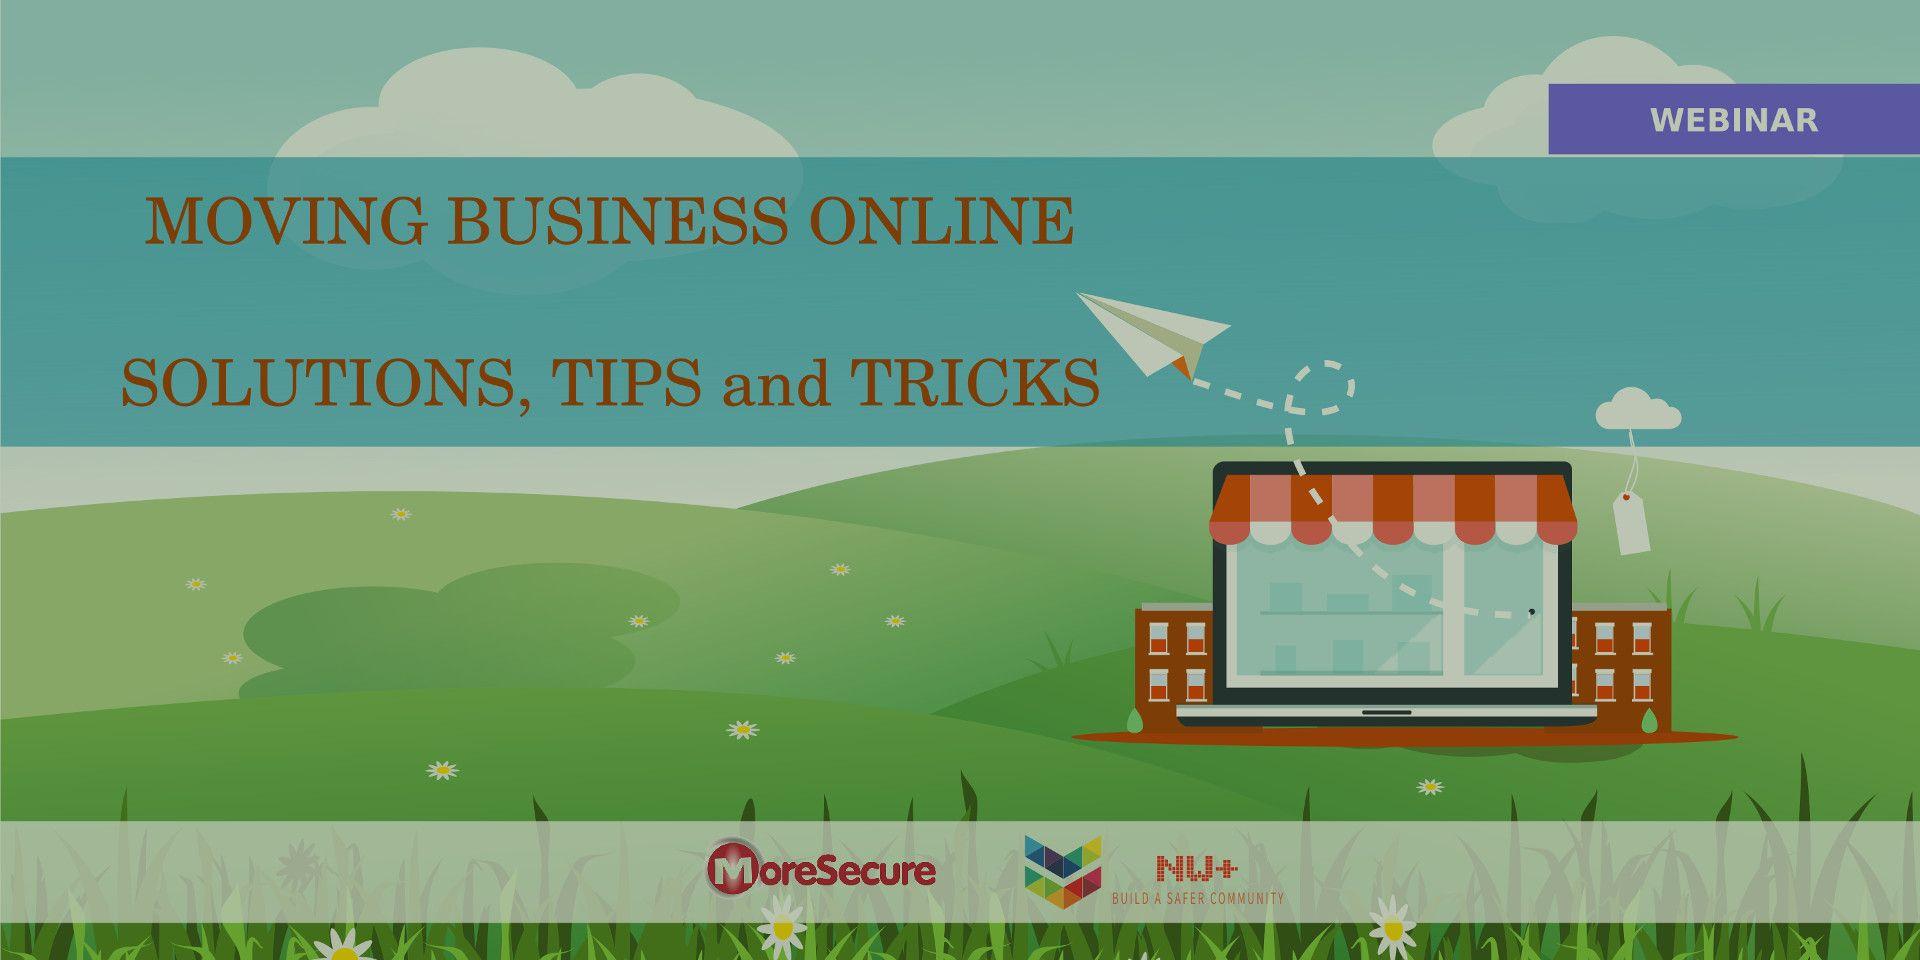 Moving Business Online Solutions Webinar